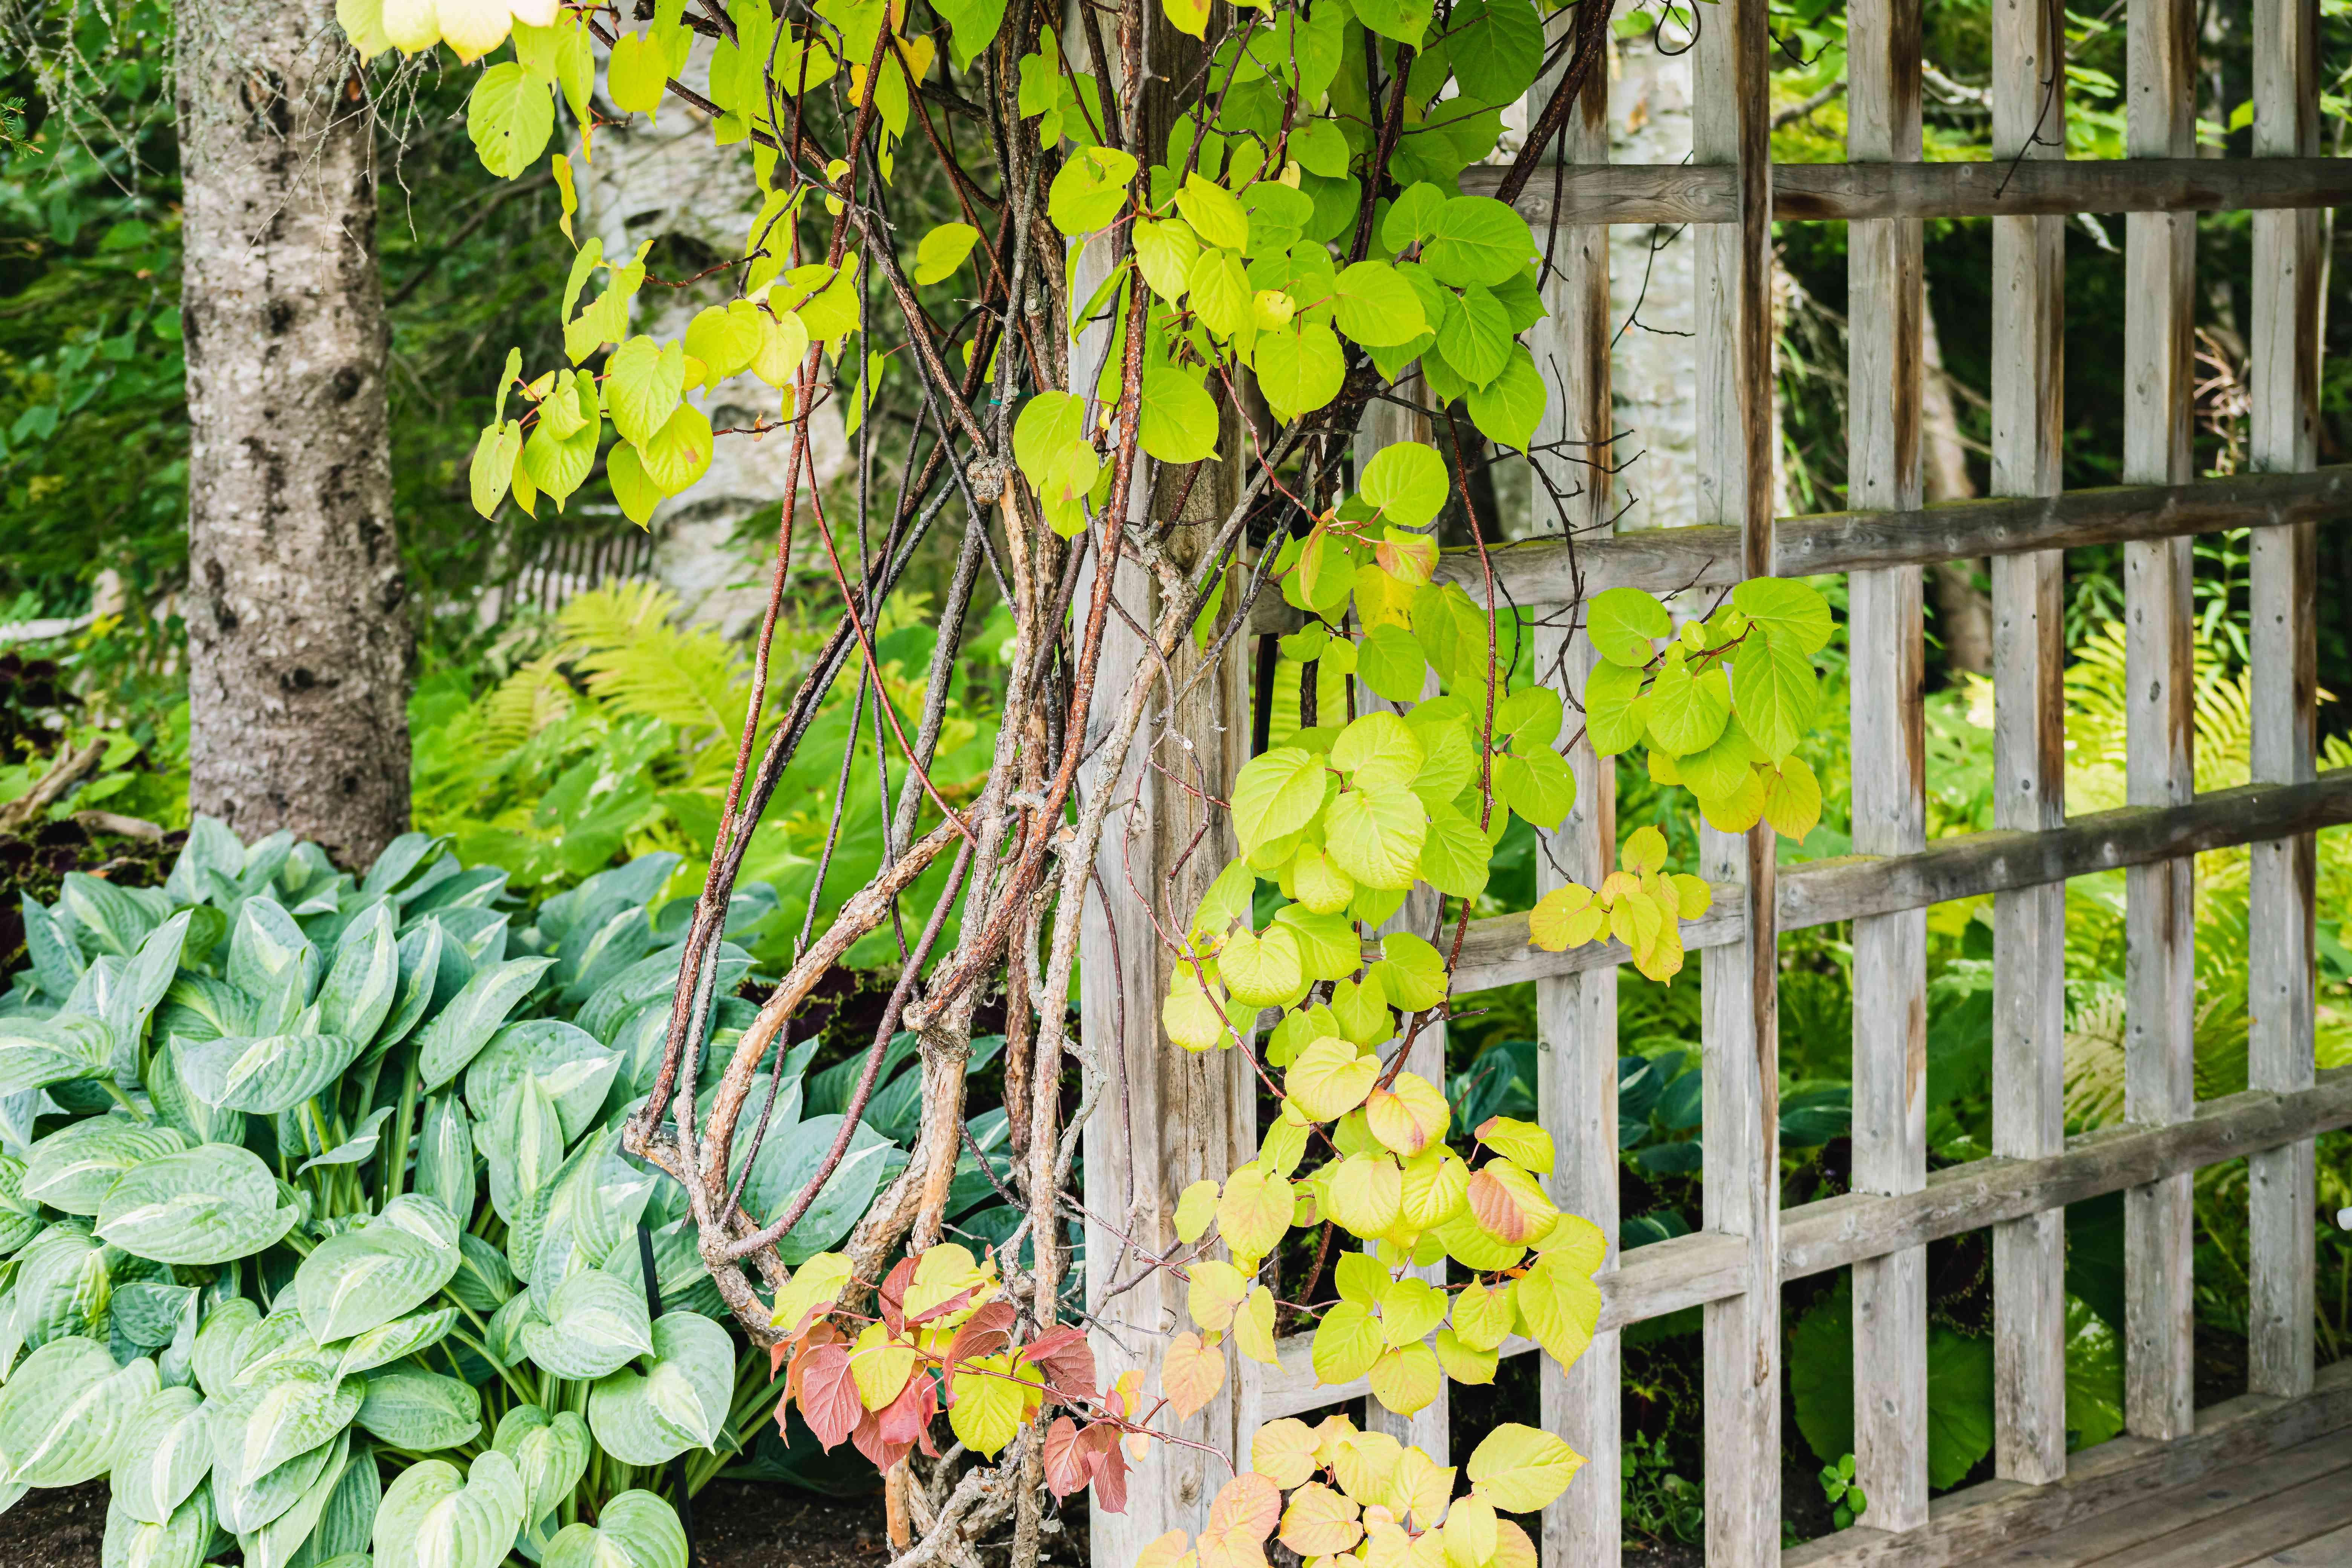 kiwi vine growing on a trellis